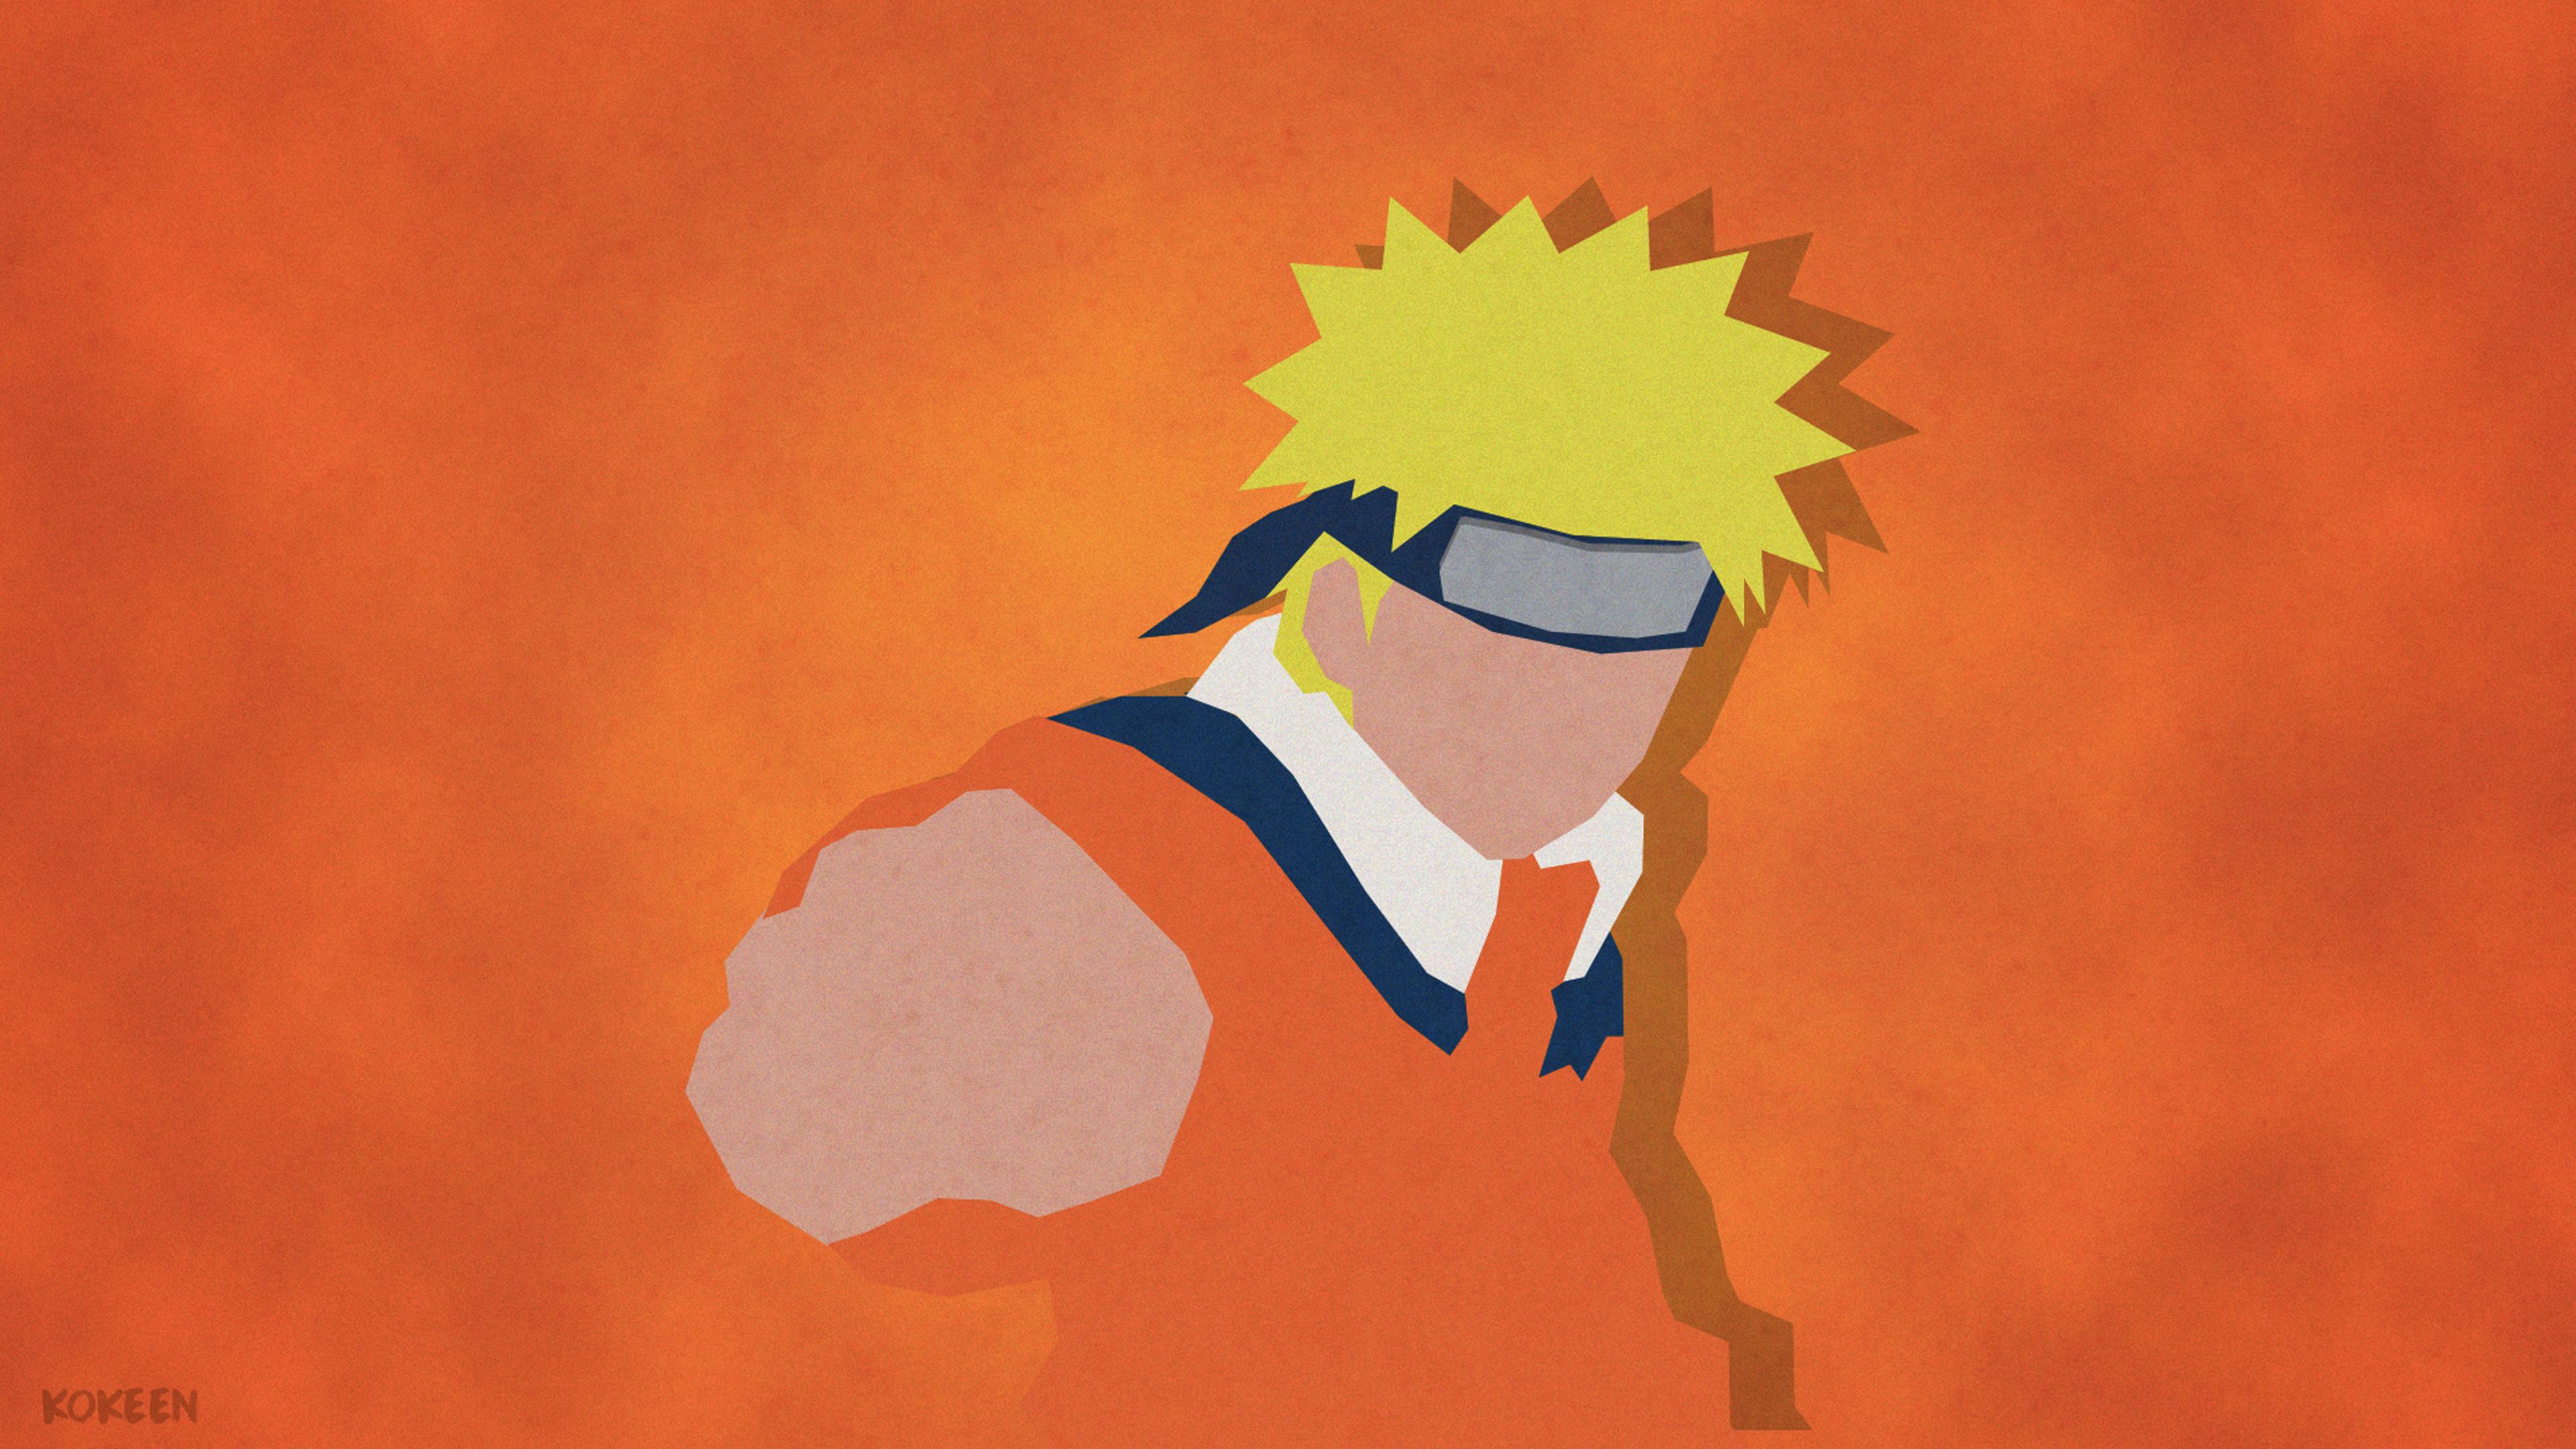 3d Wallpaper For Mobile 480x800 Uzumaki Naruto Shippuuden Minimalism 4k Hd Anime 4k